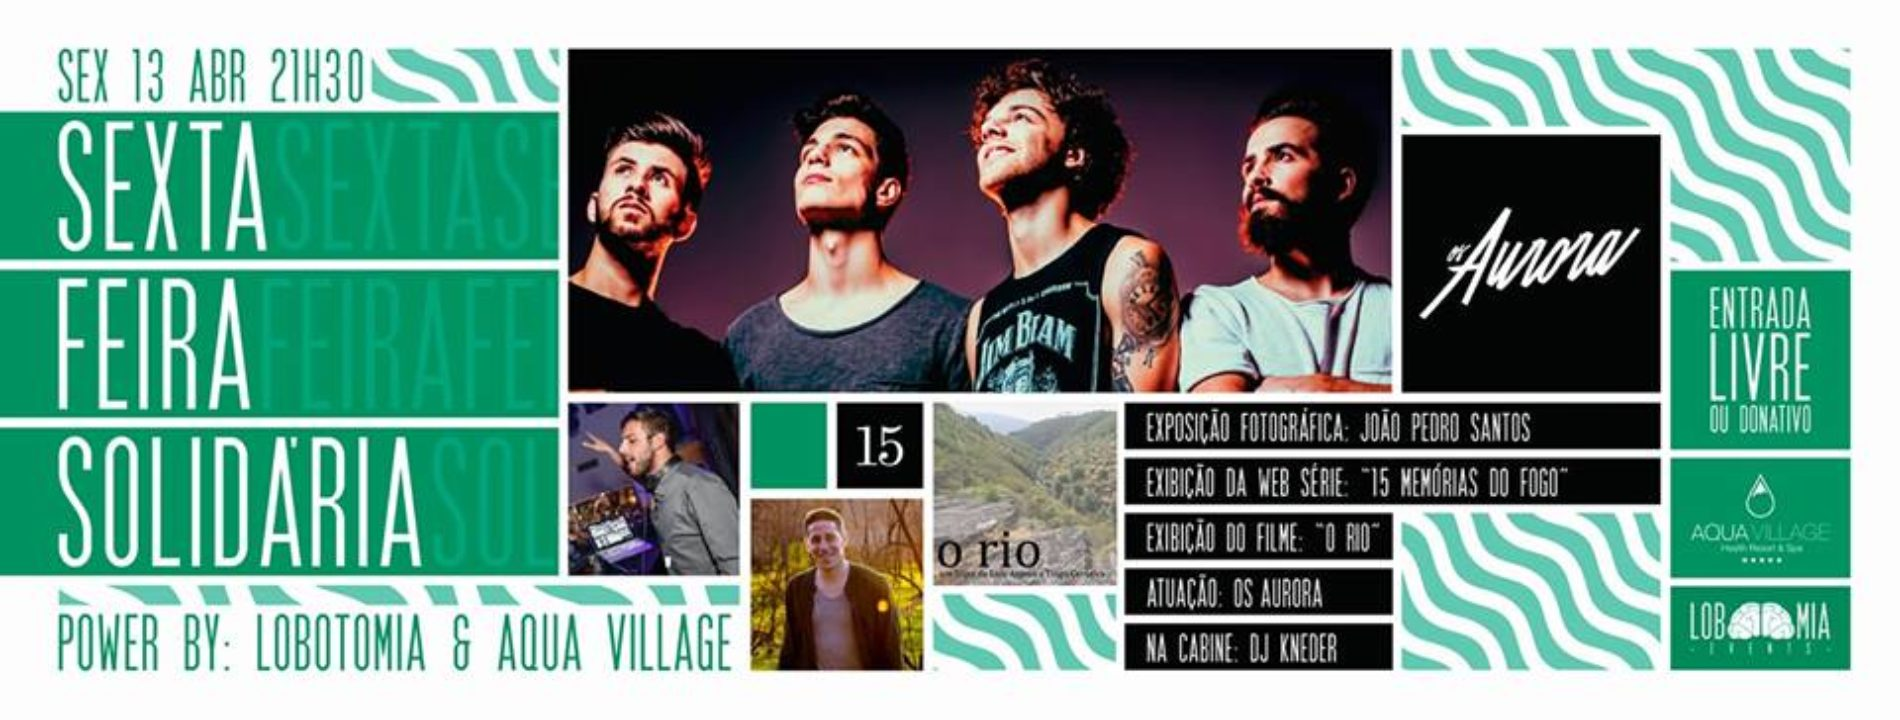 Aqua Village promove concerto solidário de apoio às vítimas dos fogos